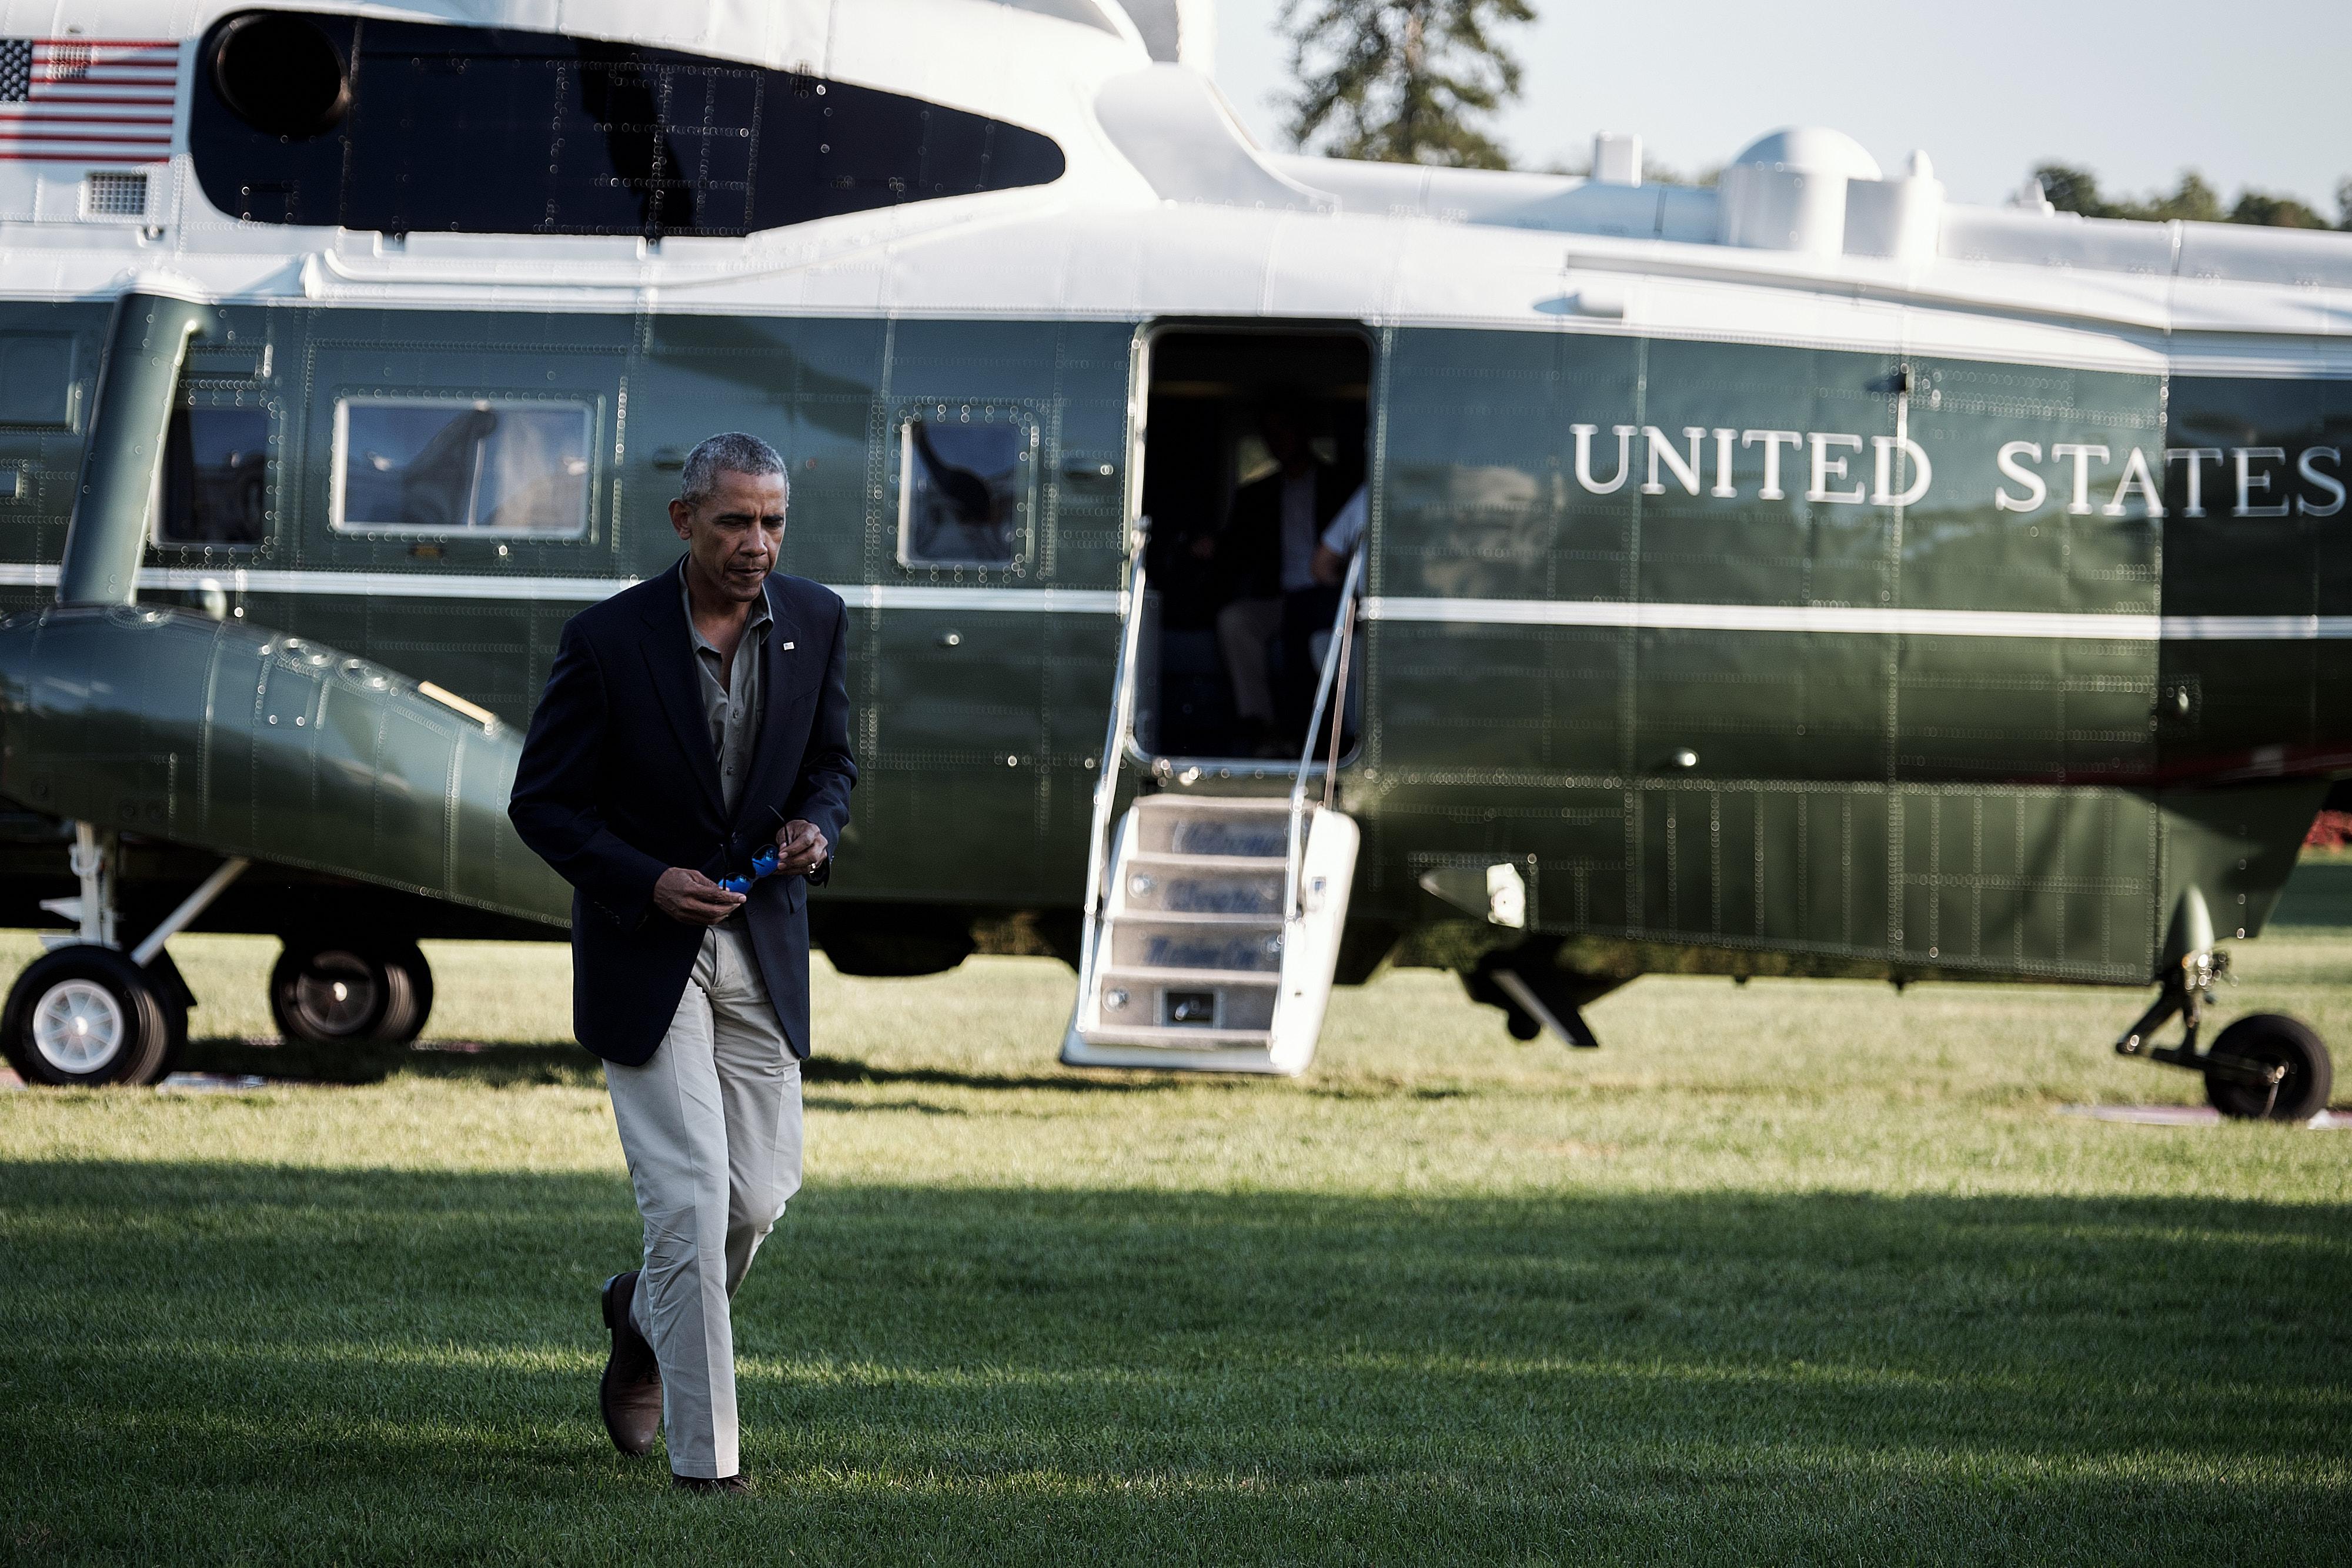 President Obama Returns From Louisiana to View Flooding Impact